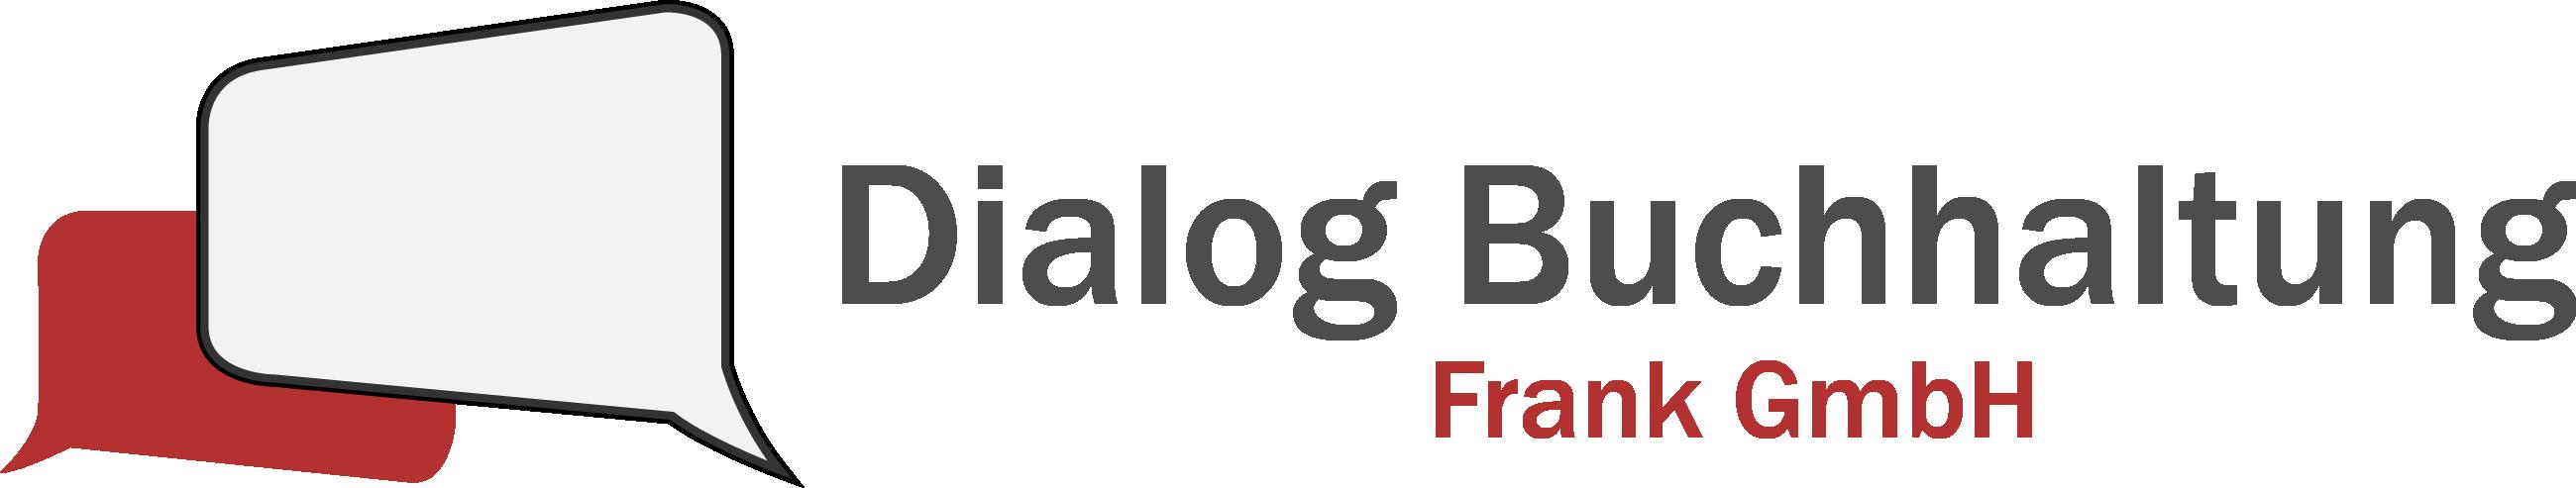 Dialog-Buchhaltung